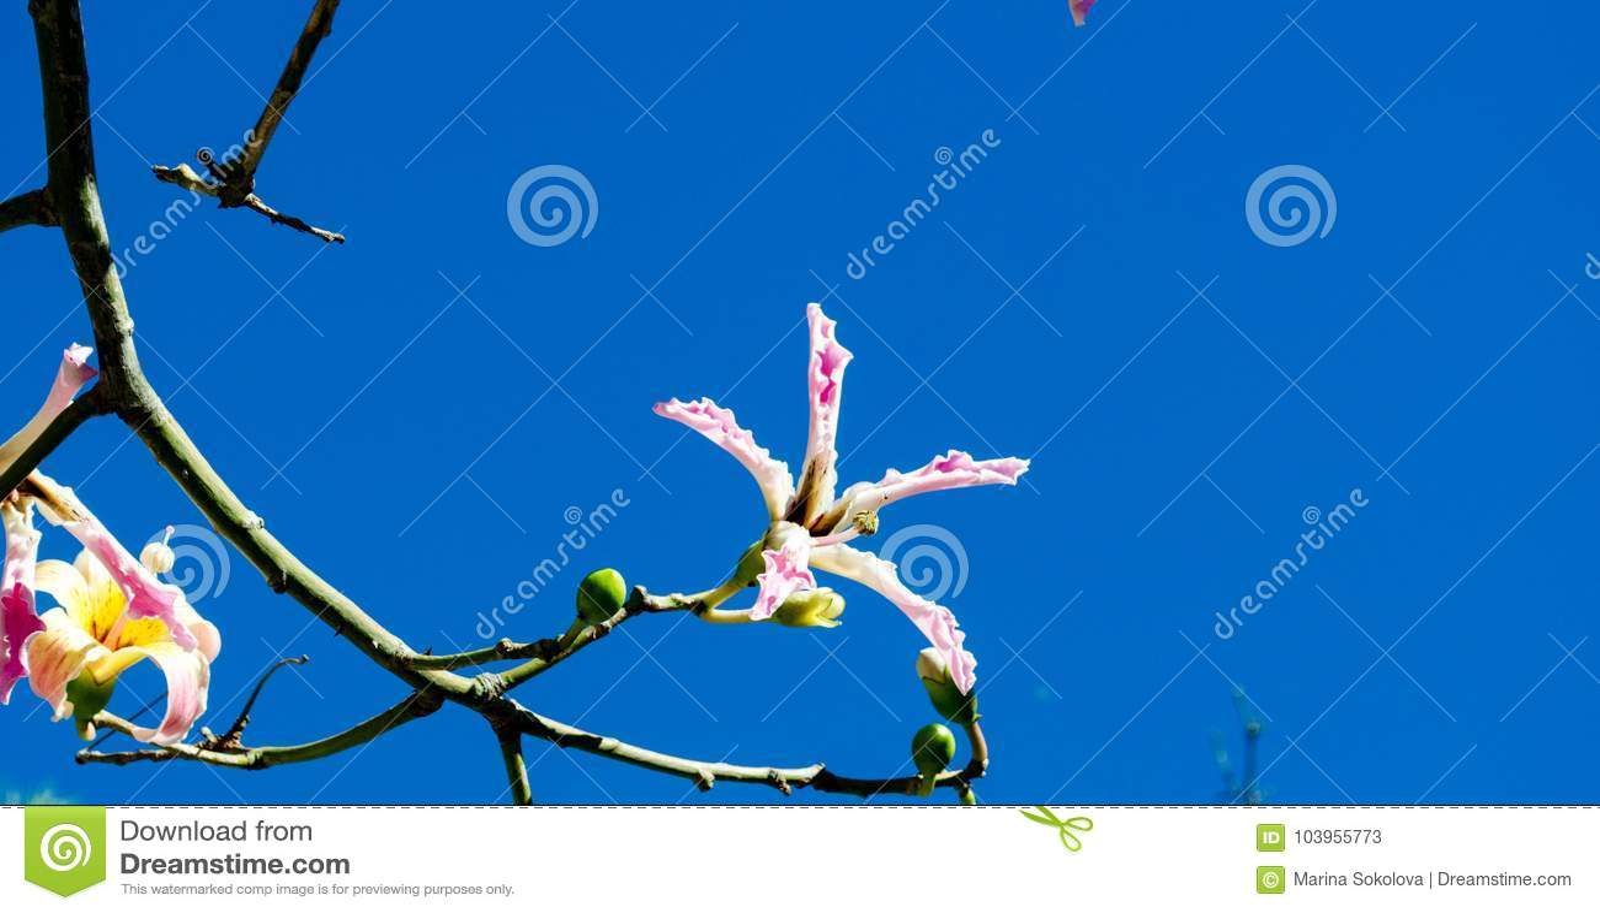 Flowering Tree Branches Stock Image Image Of Season 103955773